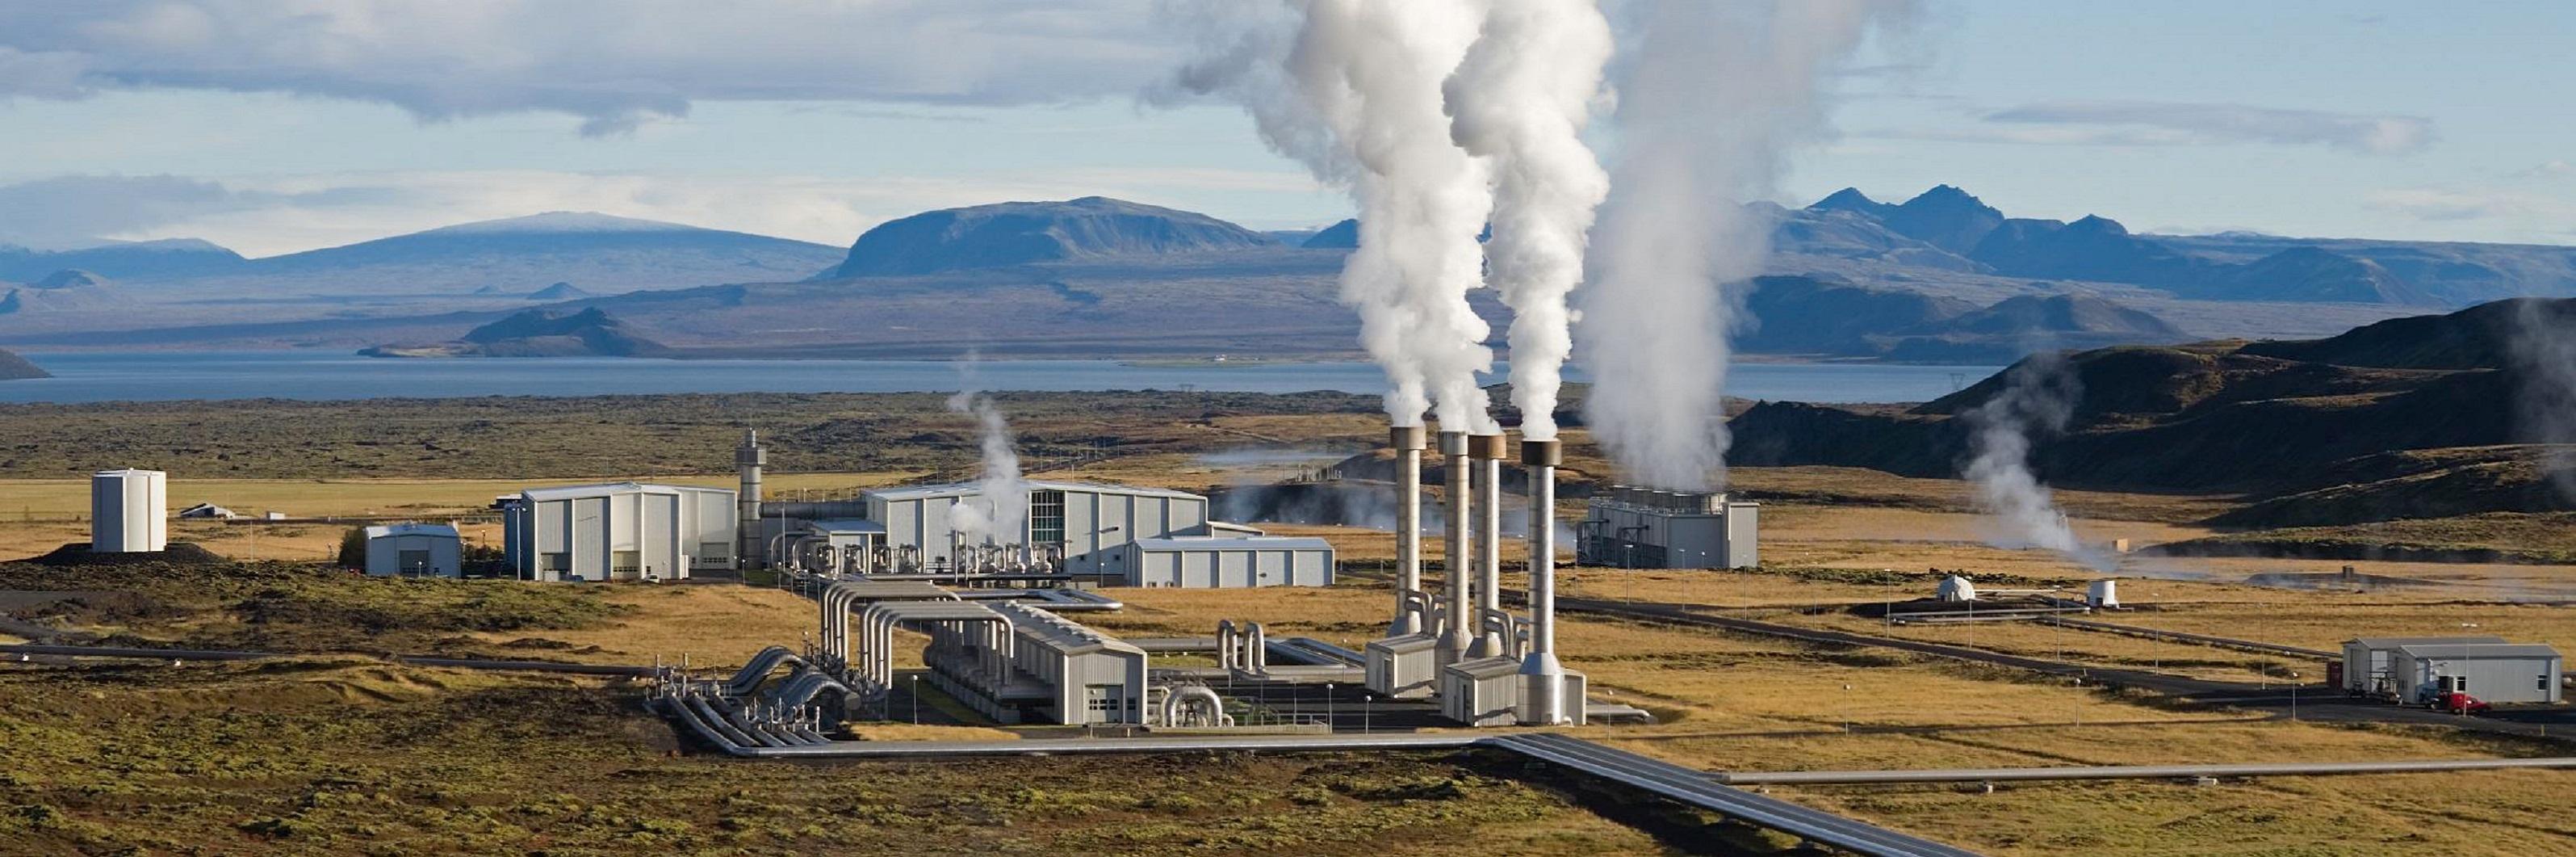 gw-fact-geothermal-energy